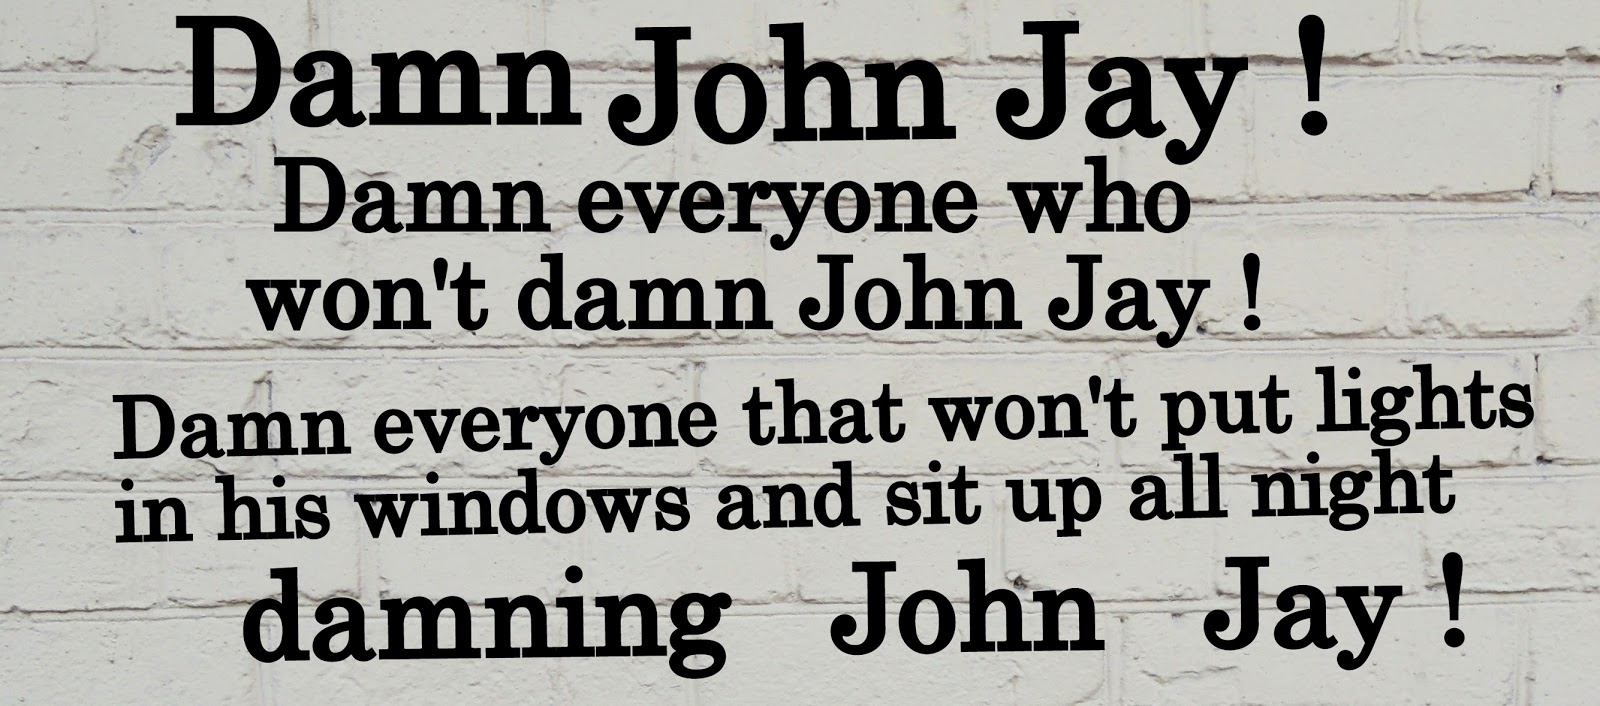 Madison's Bad Blood with Washington Part III: Damn John Jay!